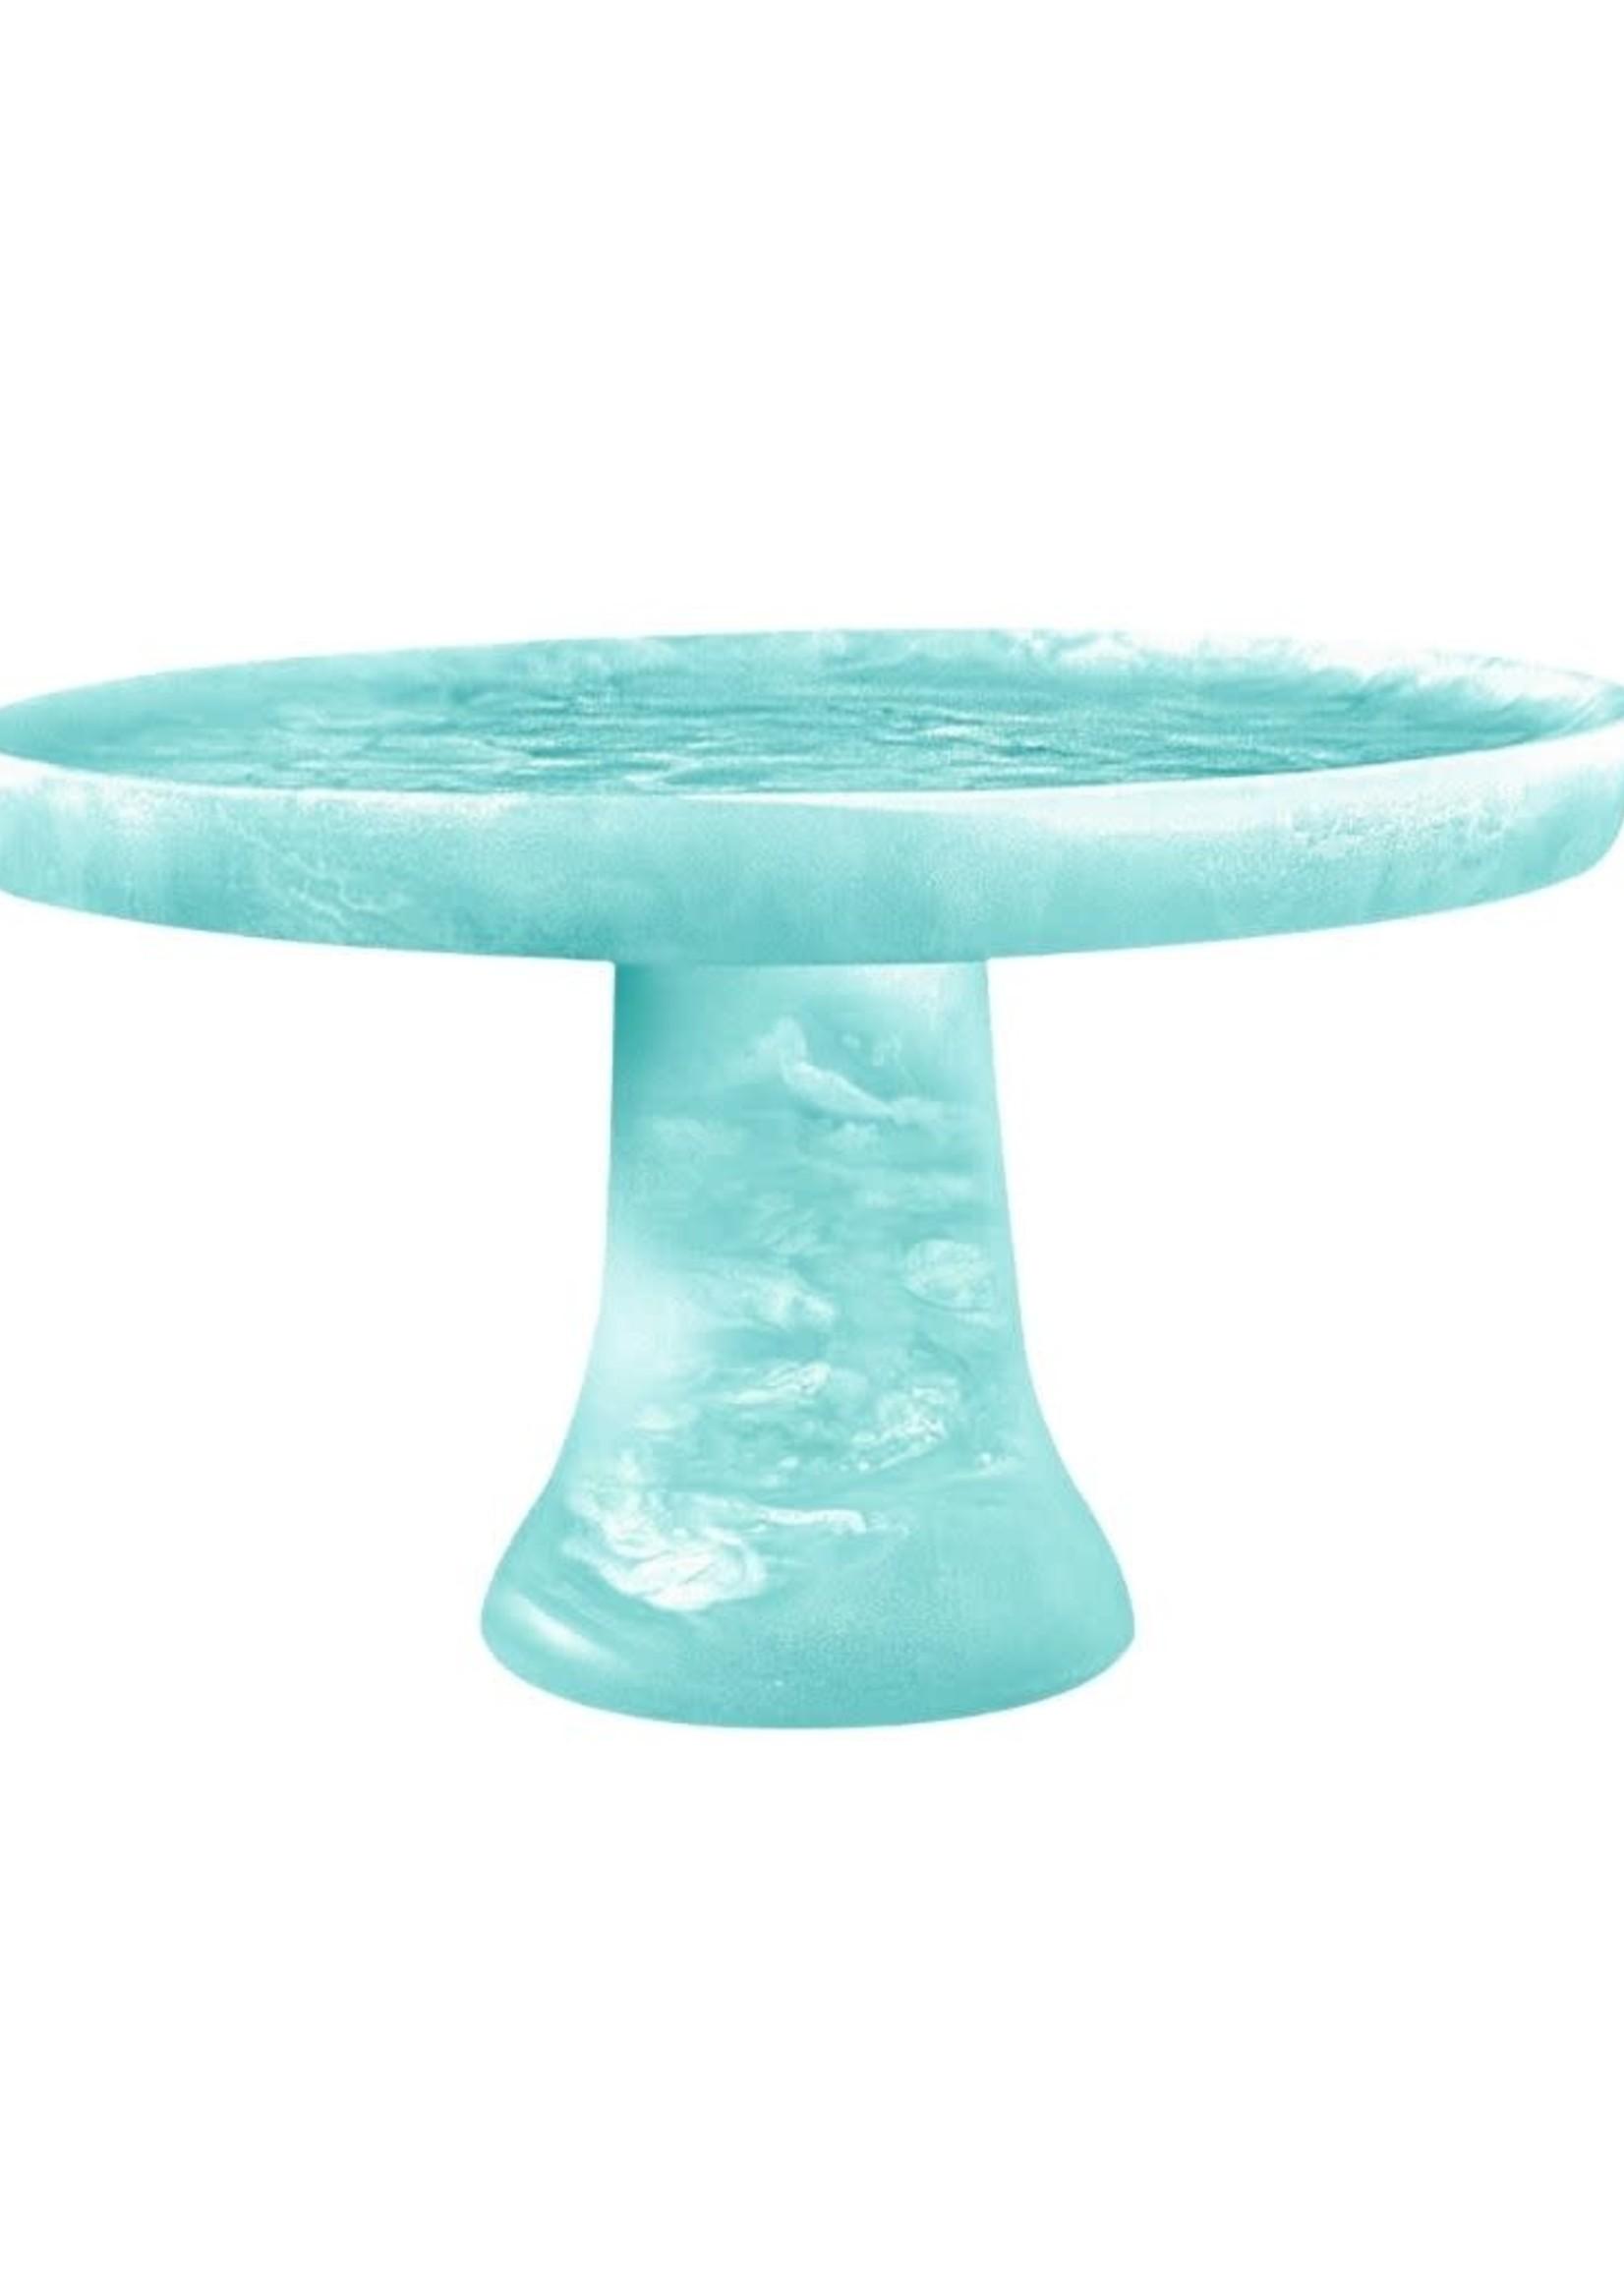 Footed Cake Stand // Aqua Swirl